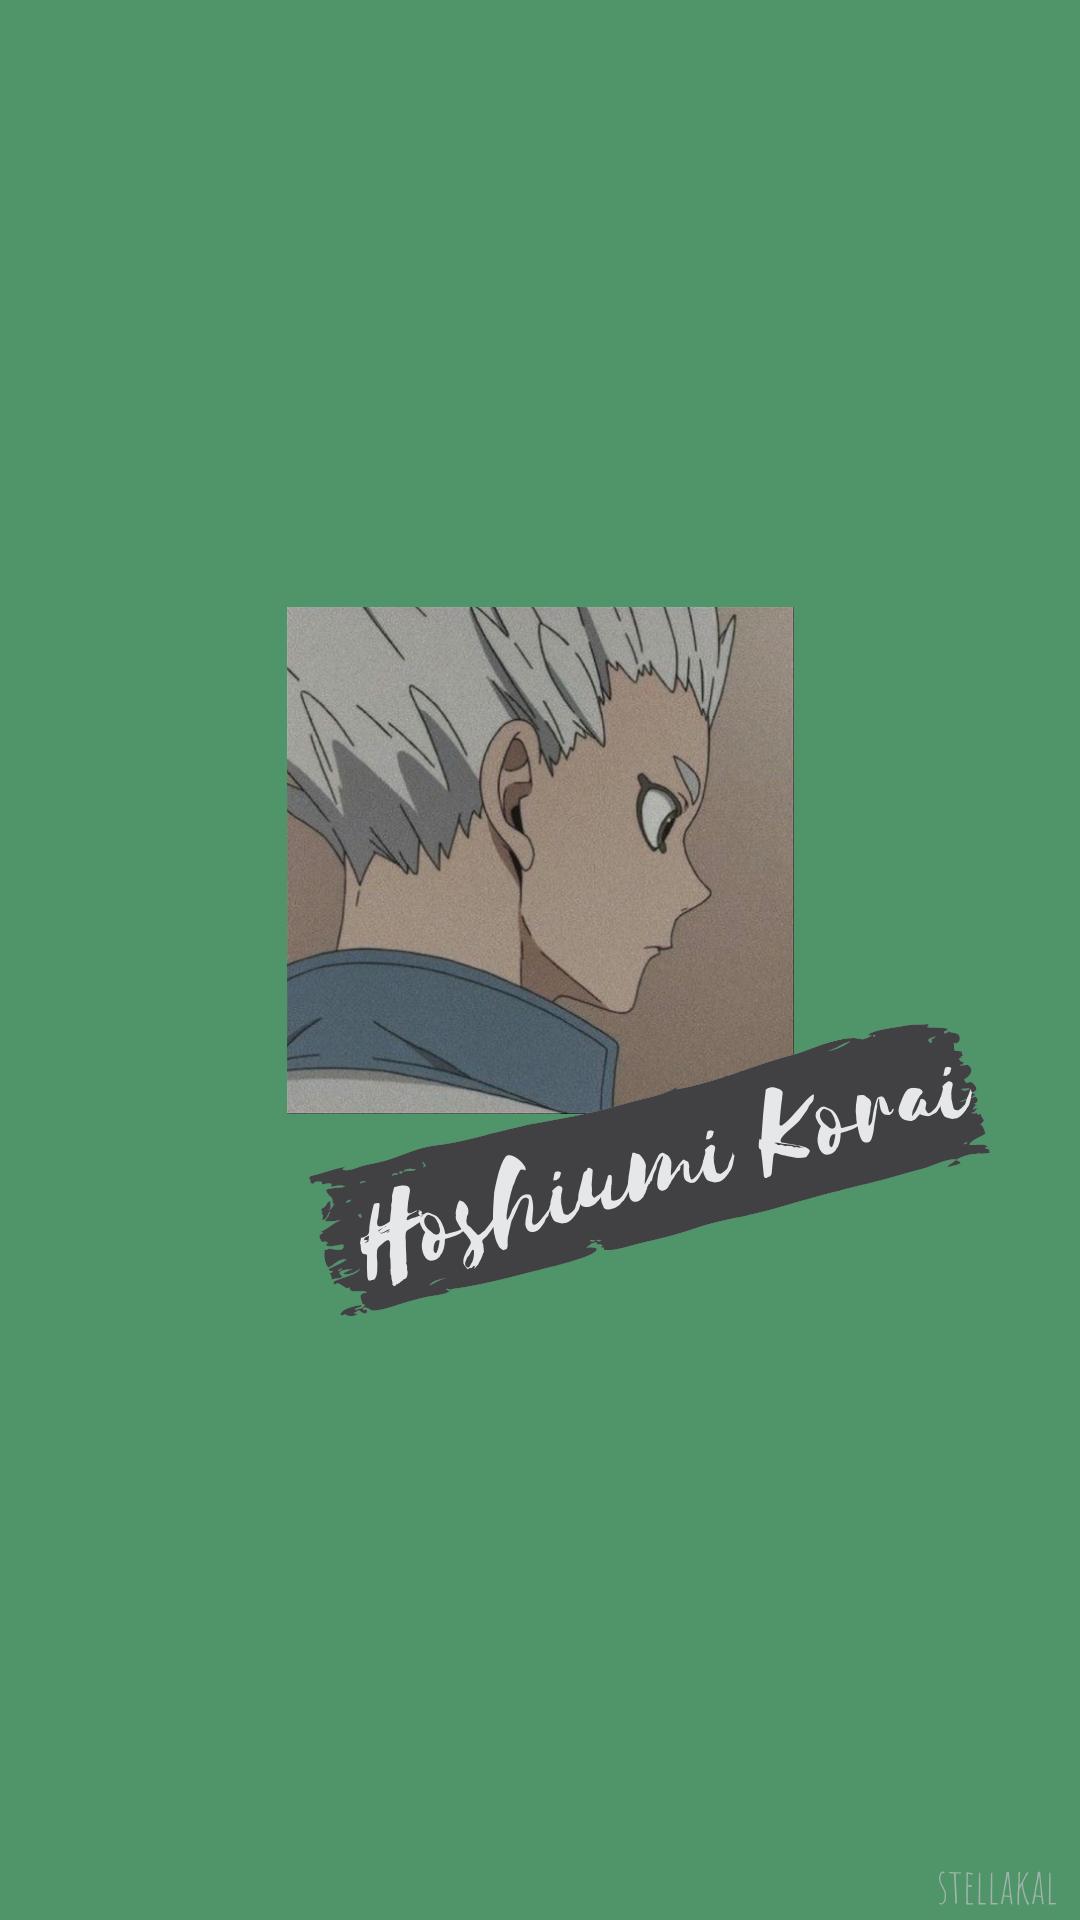 Hoshiumi Korai Haikyuu Wallpaper In 2020 Haikyuu Wallpaper Haikyuu Anime Haikyuu